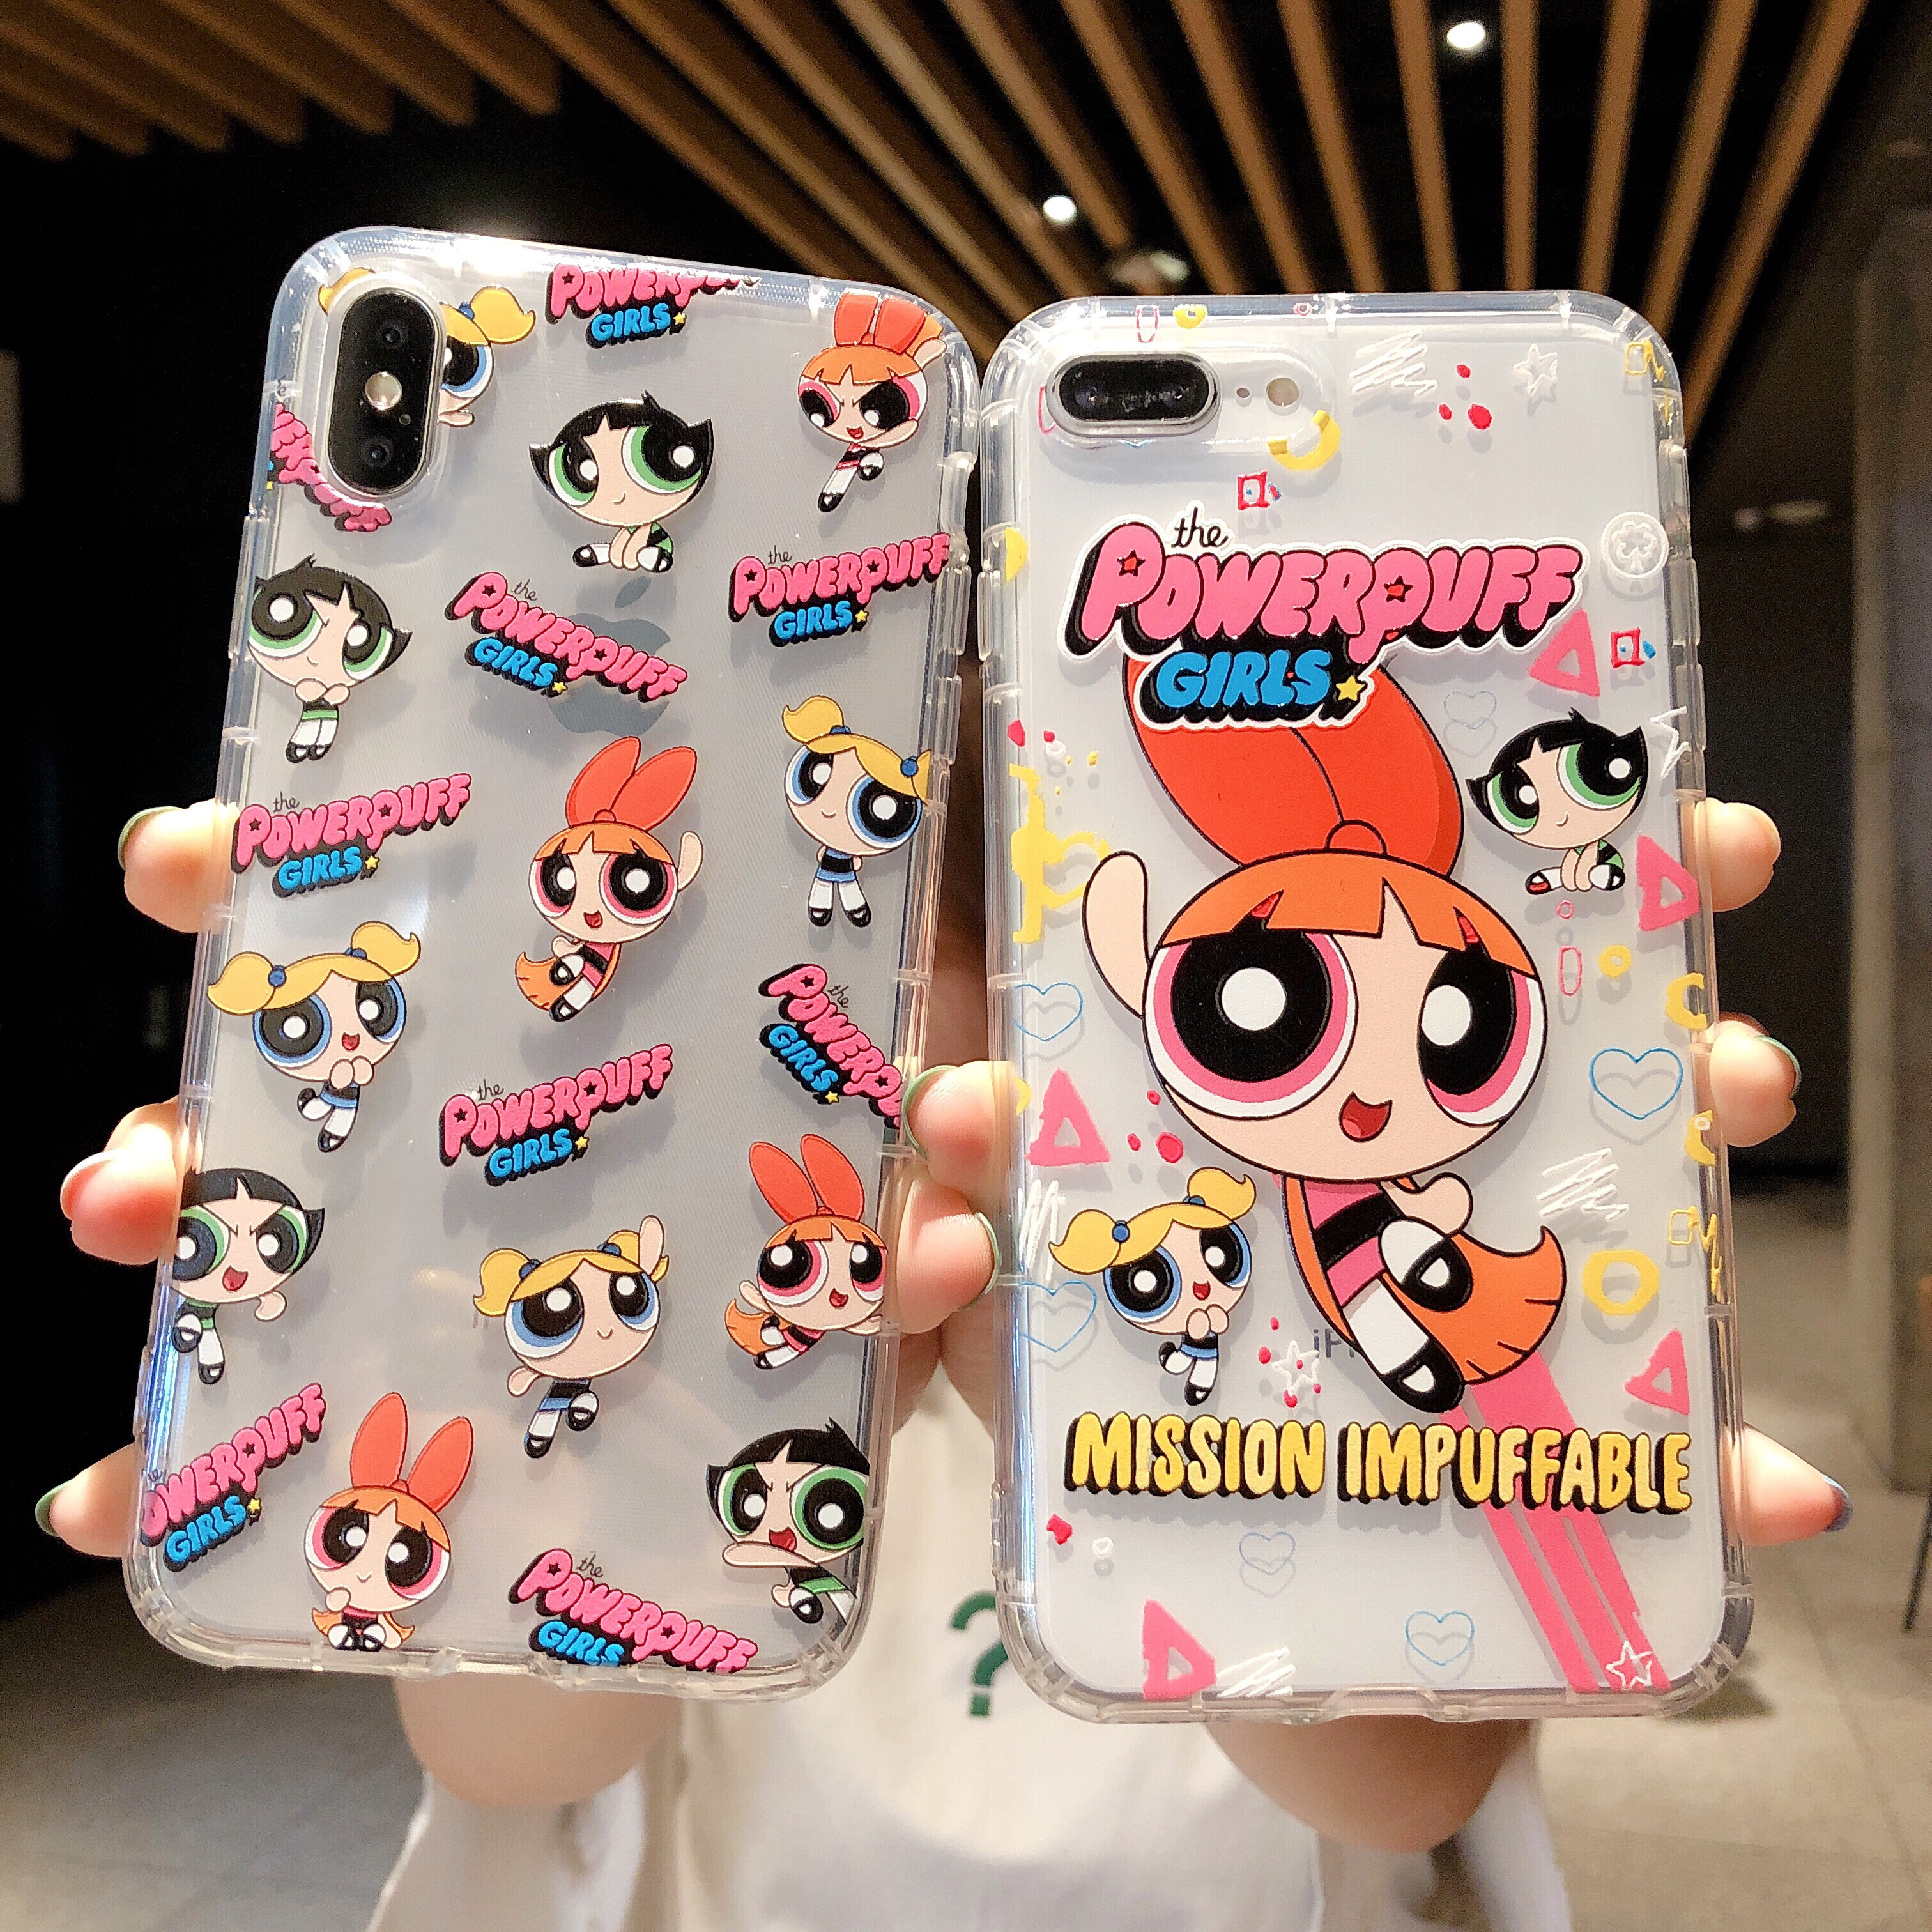 Cartoon Super Hero powerpuff girls phone case For iphone 7 6 6S 8 Plus X XR XS MAX 10 Cute Angel soft Silicone Cover Accessories